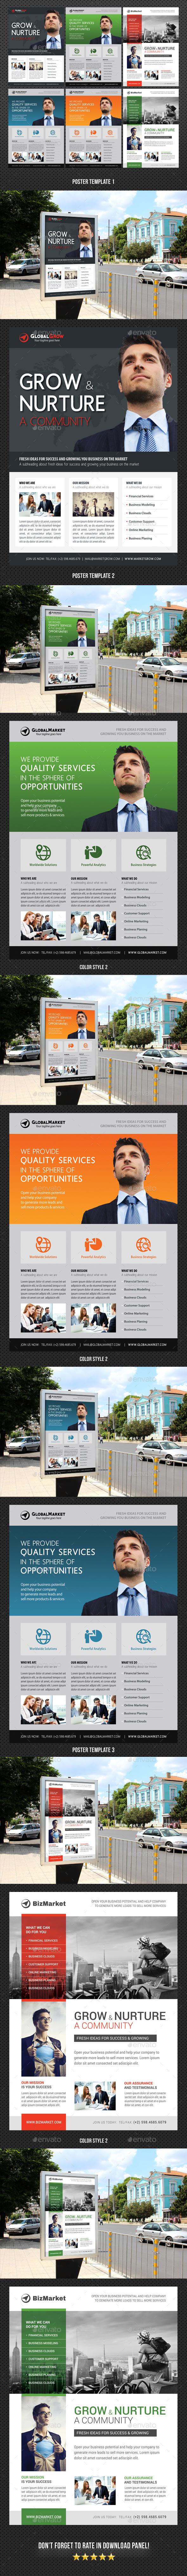 3 Corporate Business Poster Bundle 02 - Signage Print Templates